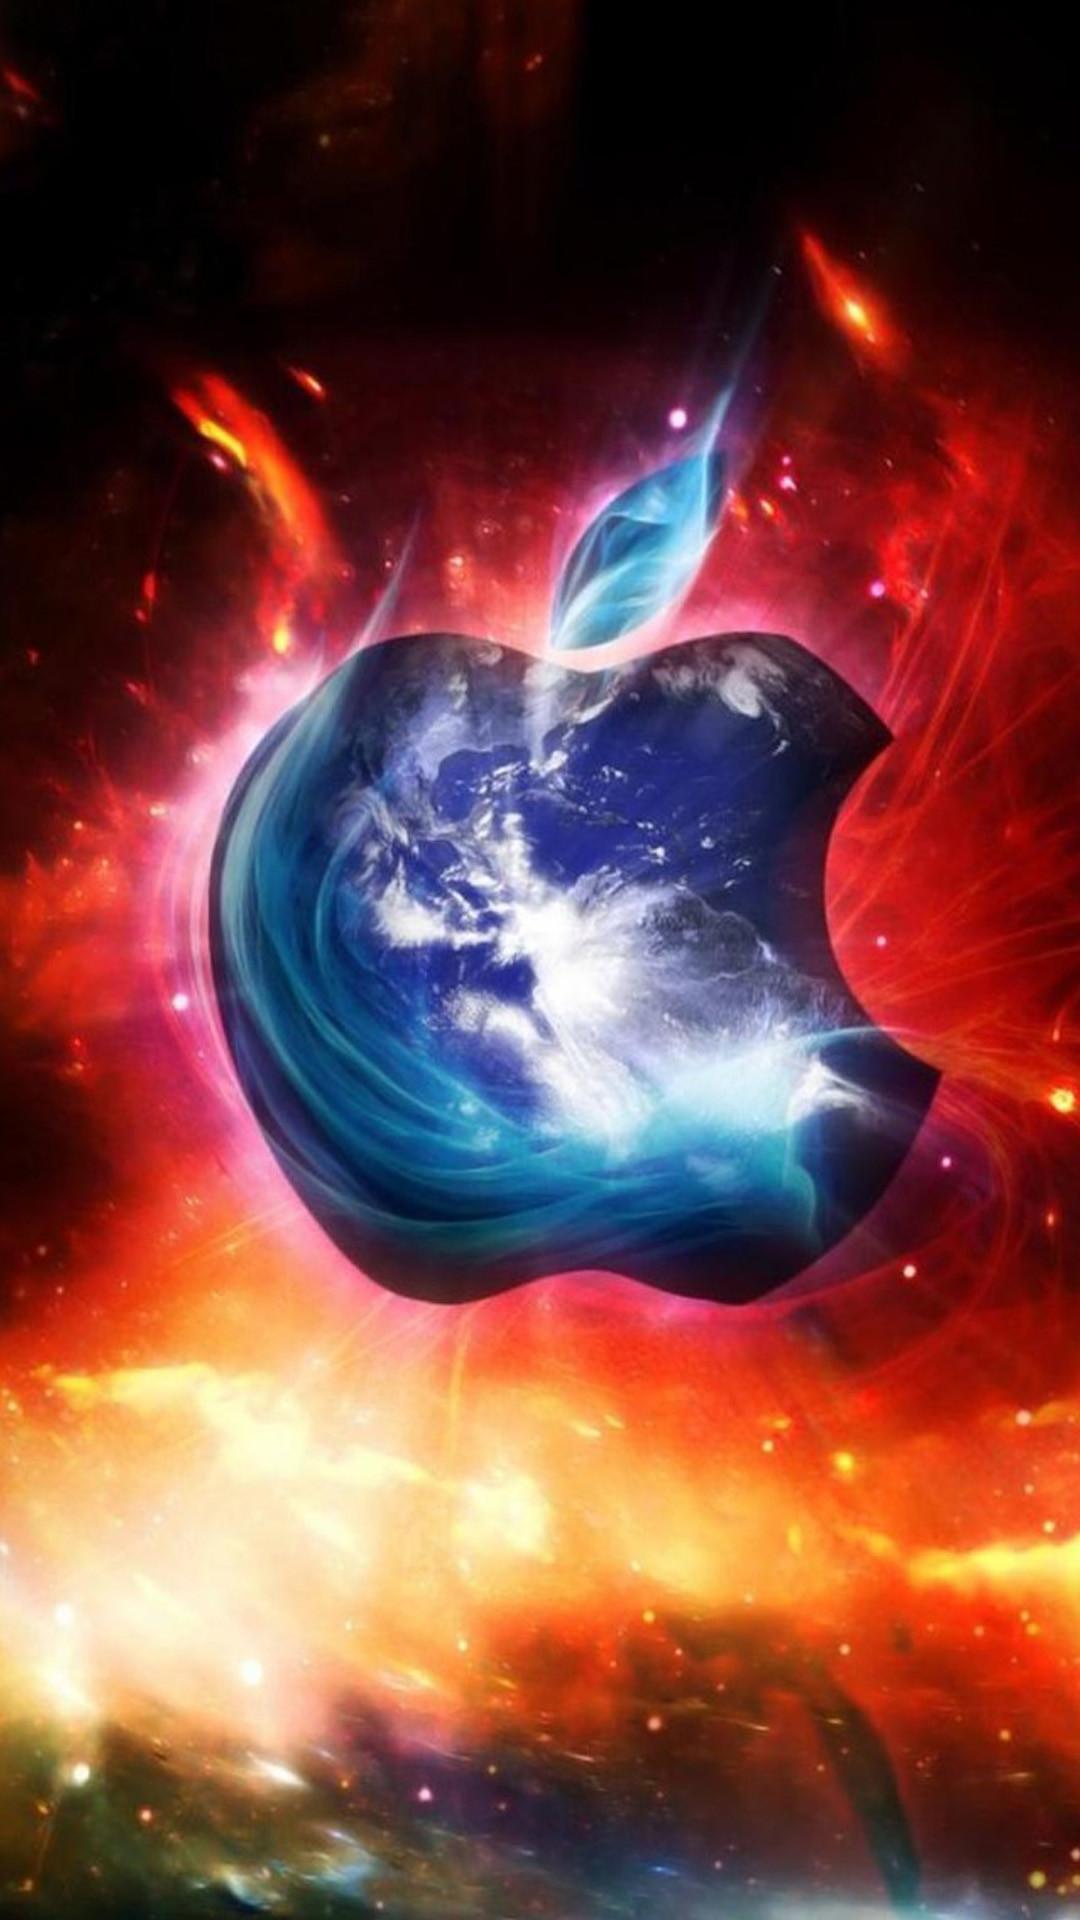 Apple Logo LG G2 Wallpapers HD 49.jpg (1080×1920)